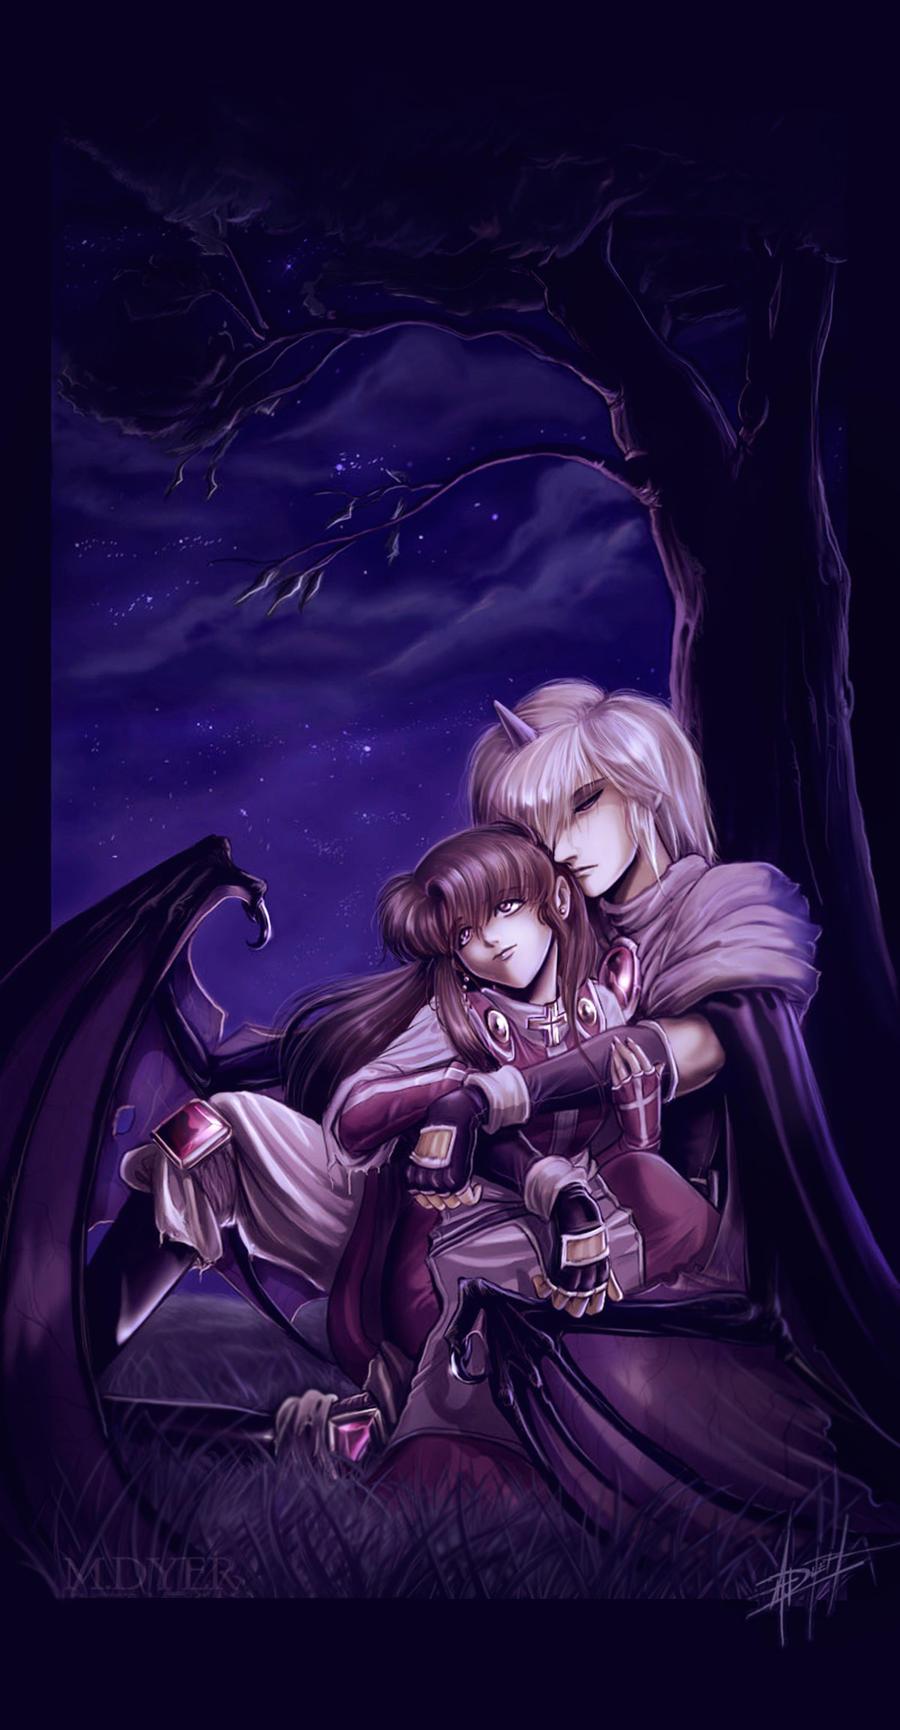 re: Lullaby by pupukachoo